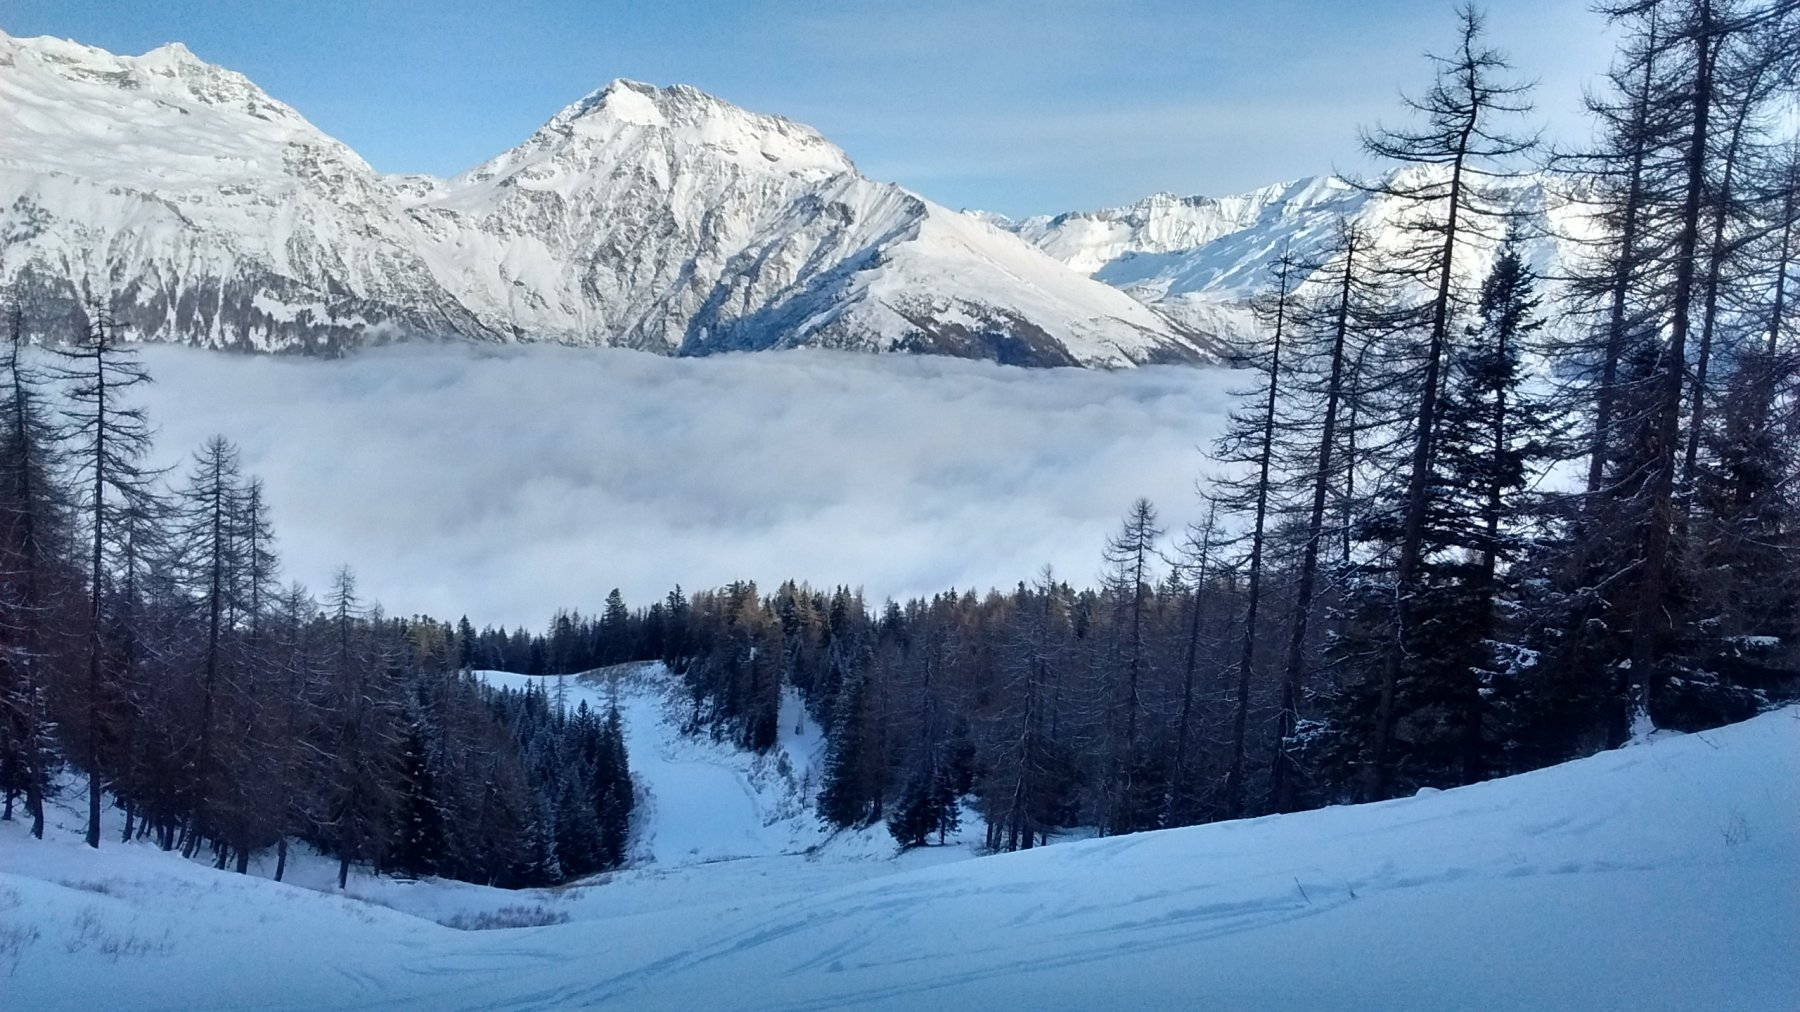 sopra la nebbia